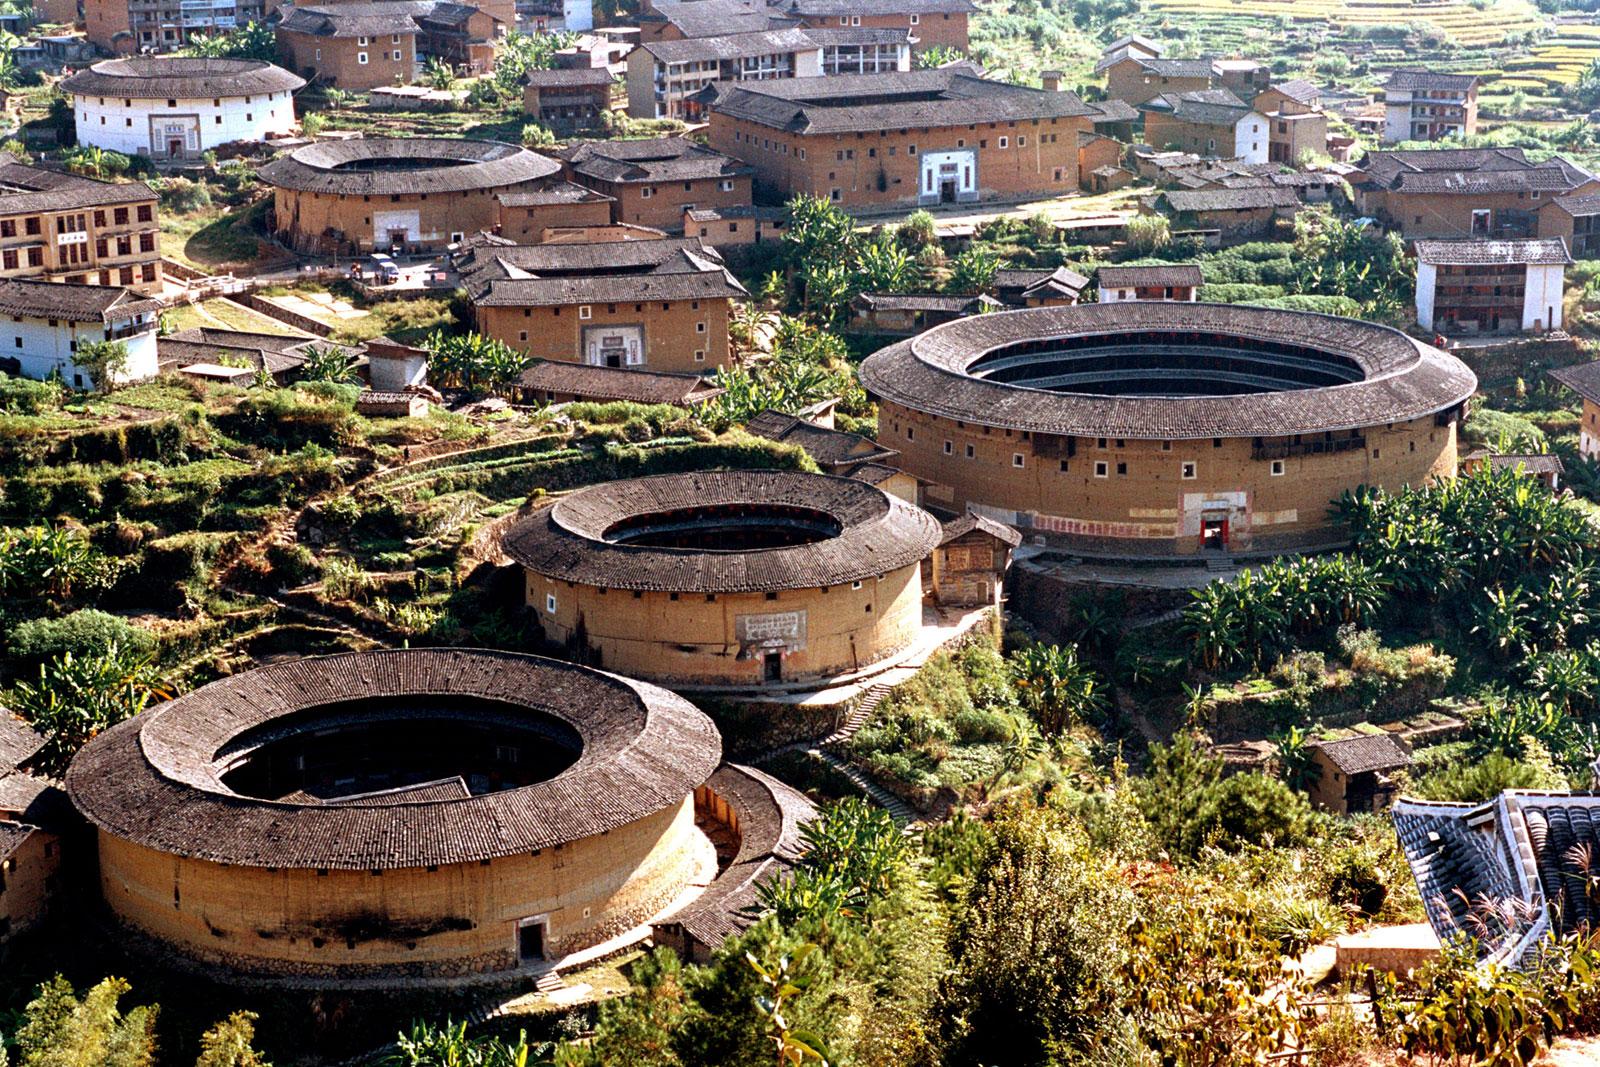 Hakka Round Earth Buildings in Tulous